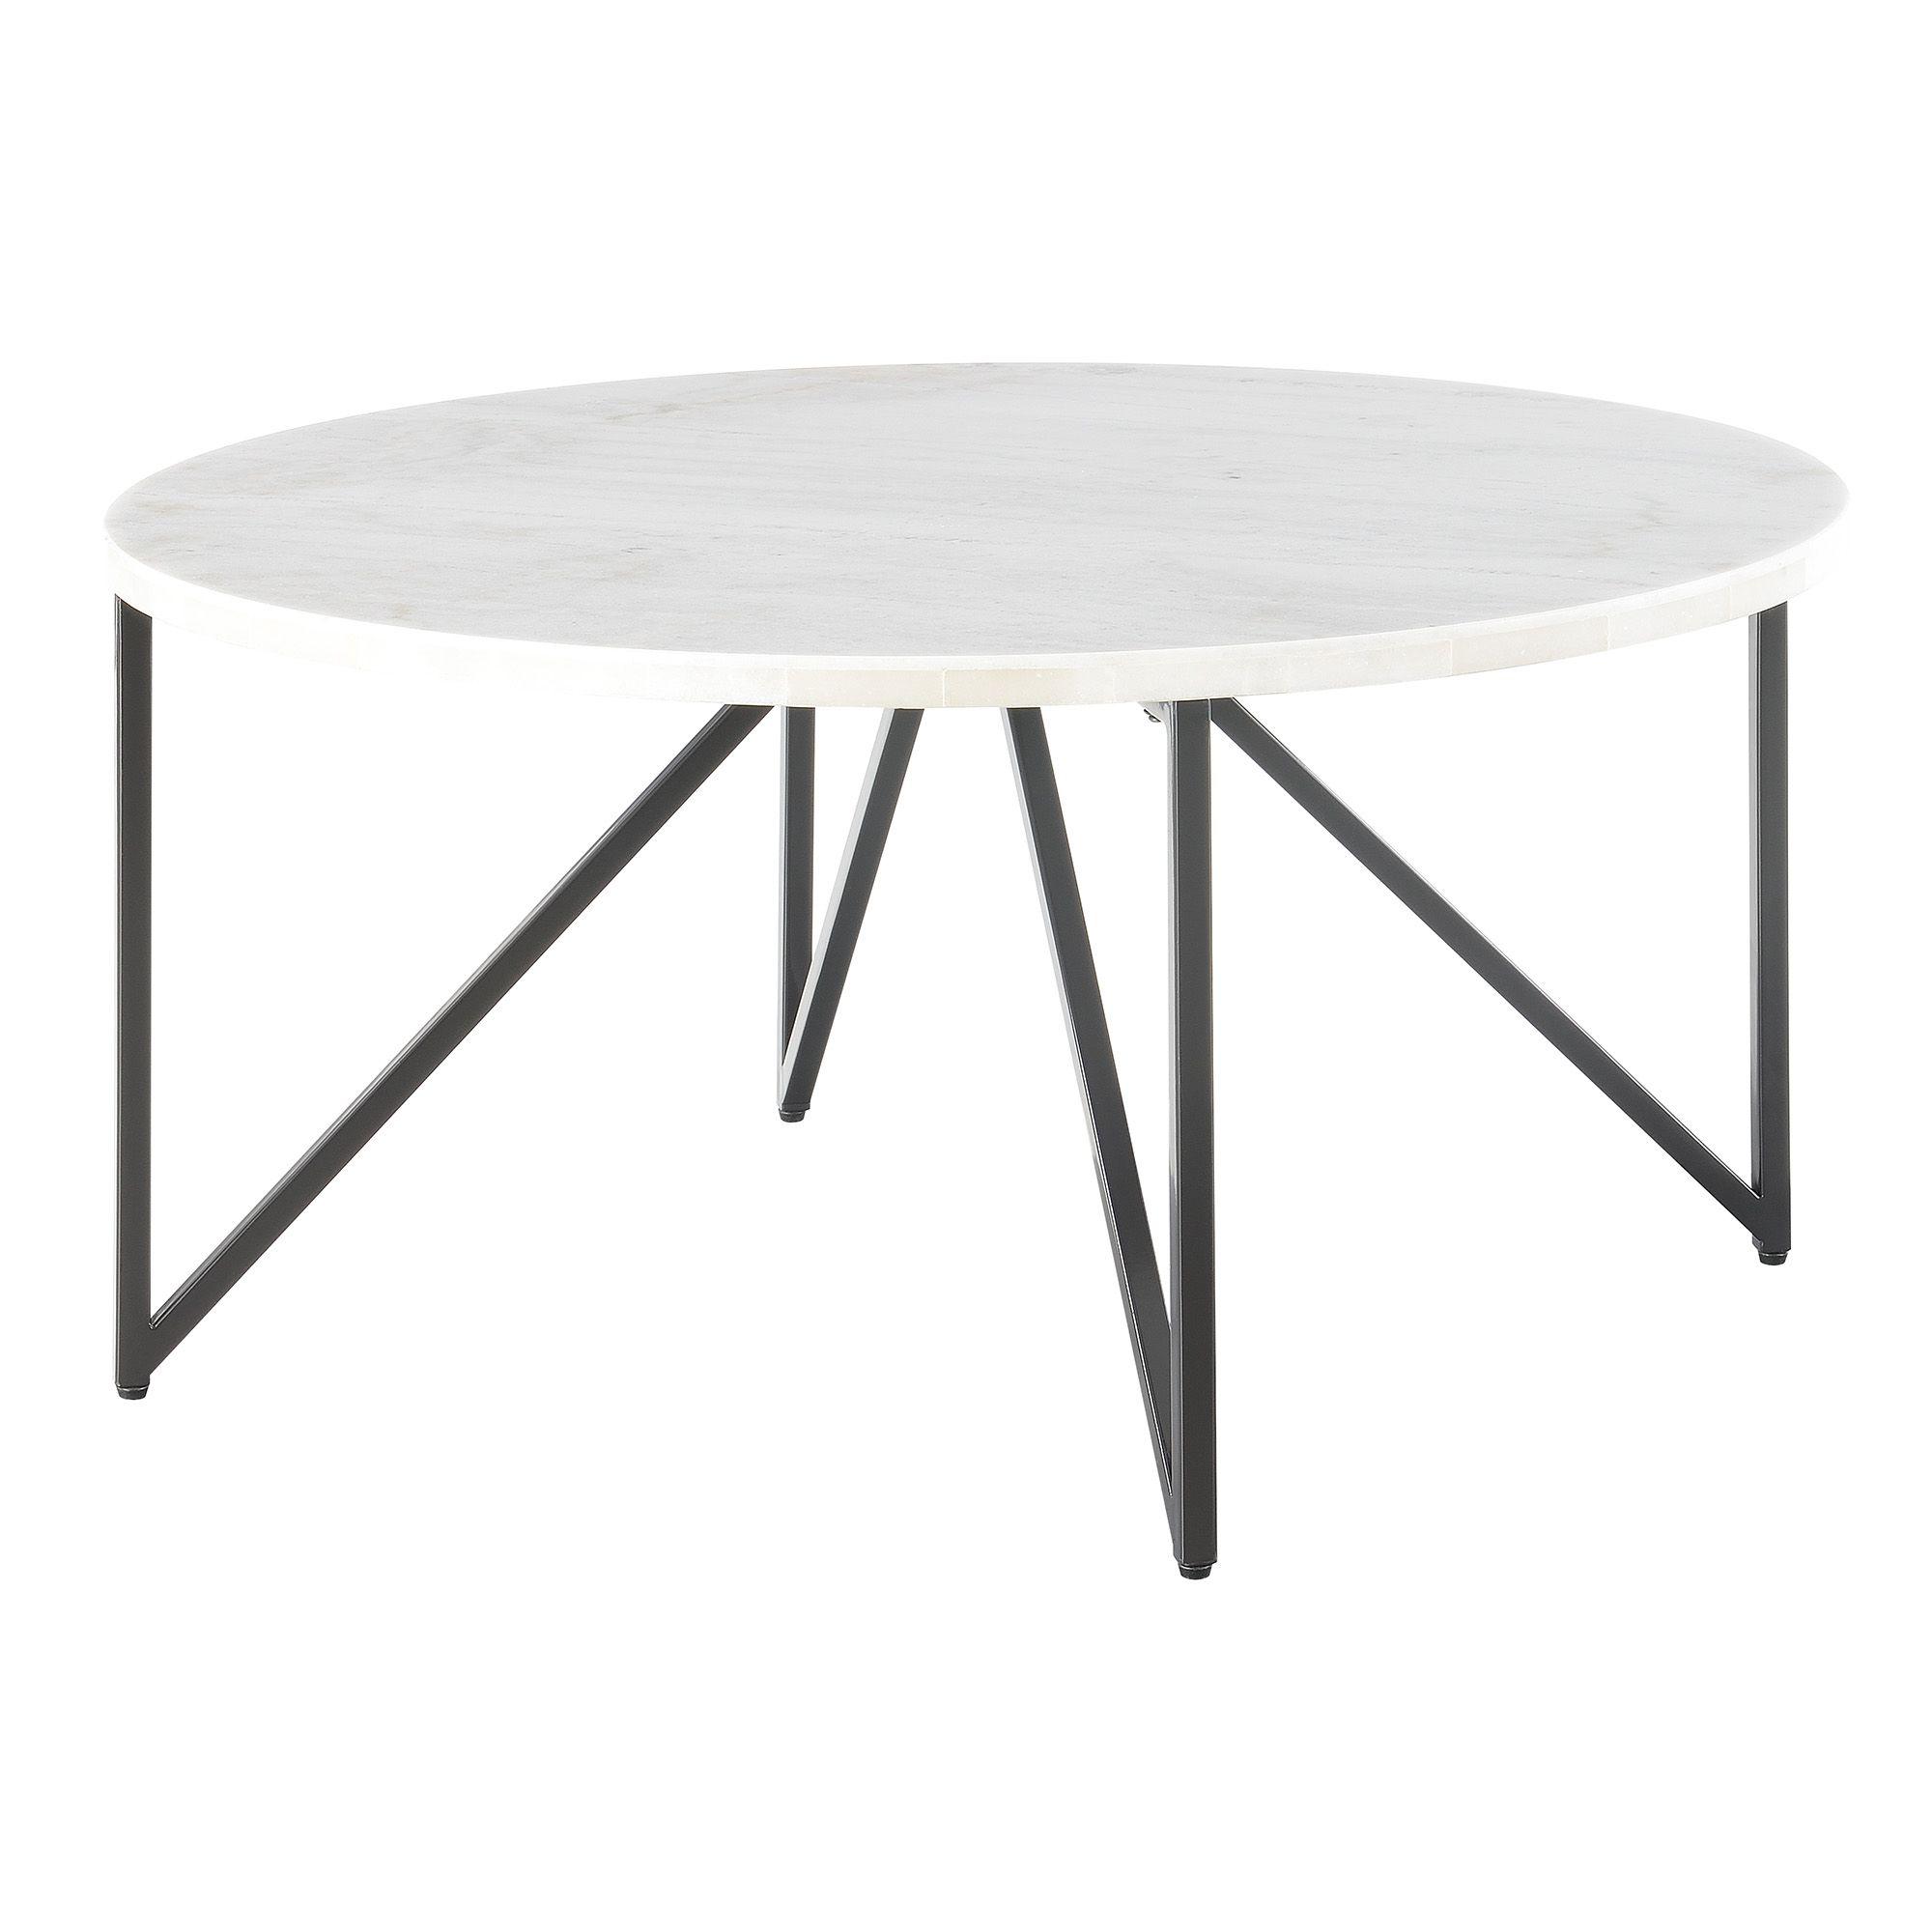 Picket House Furnishings Kinsler Round Coffee Table Walmart Com White Round Coffee Table Round Coffee Table Coffee Table [ 2000 x 2000 Pixel ]